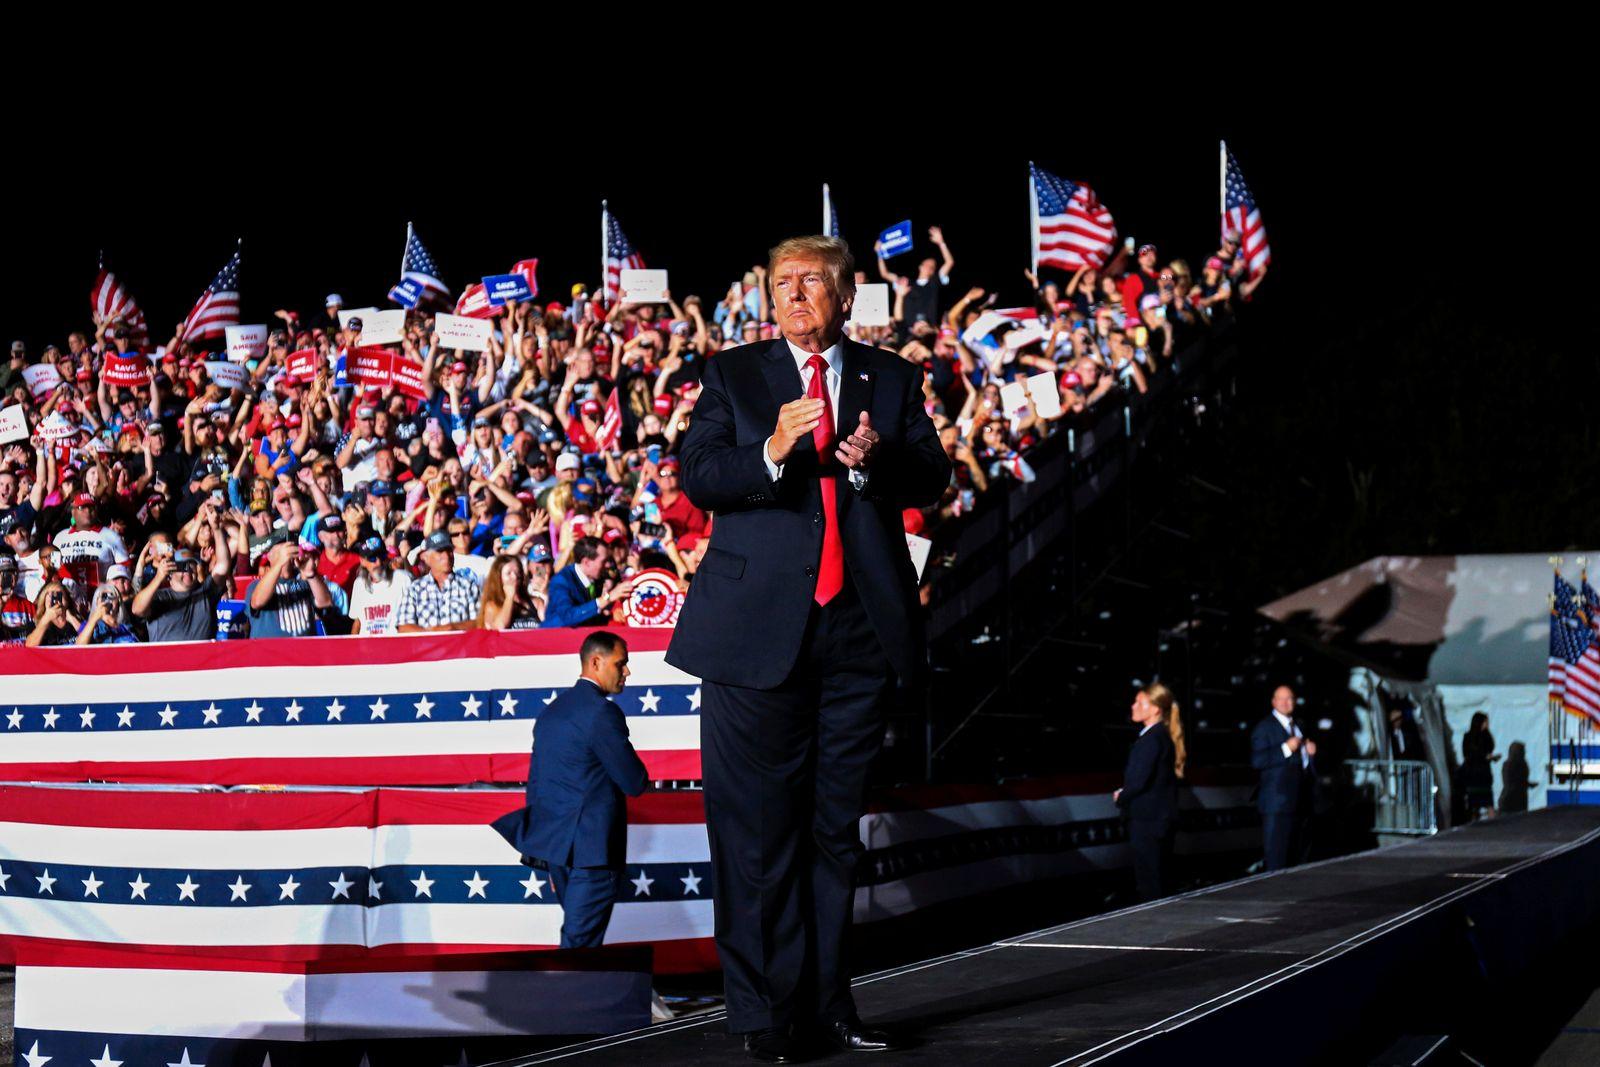 Former U.S. President Trump holds rally in Iowa